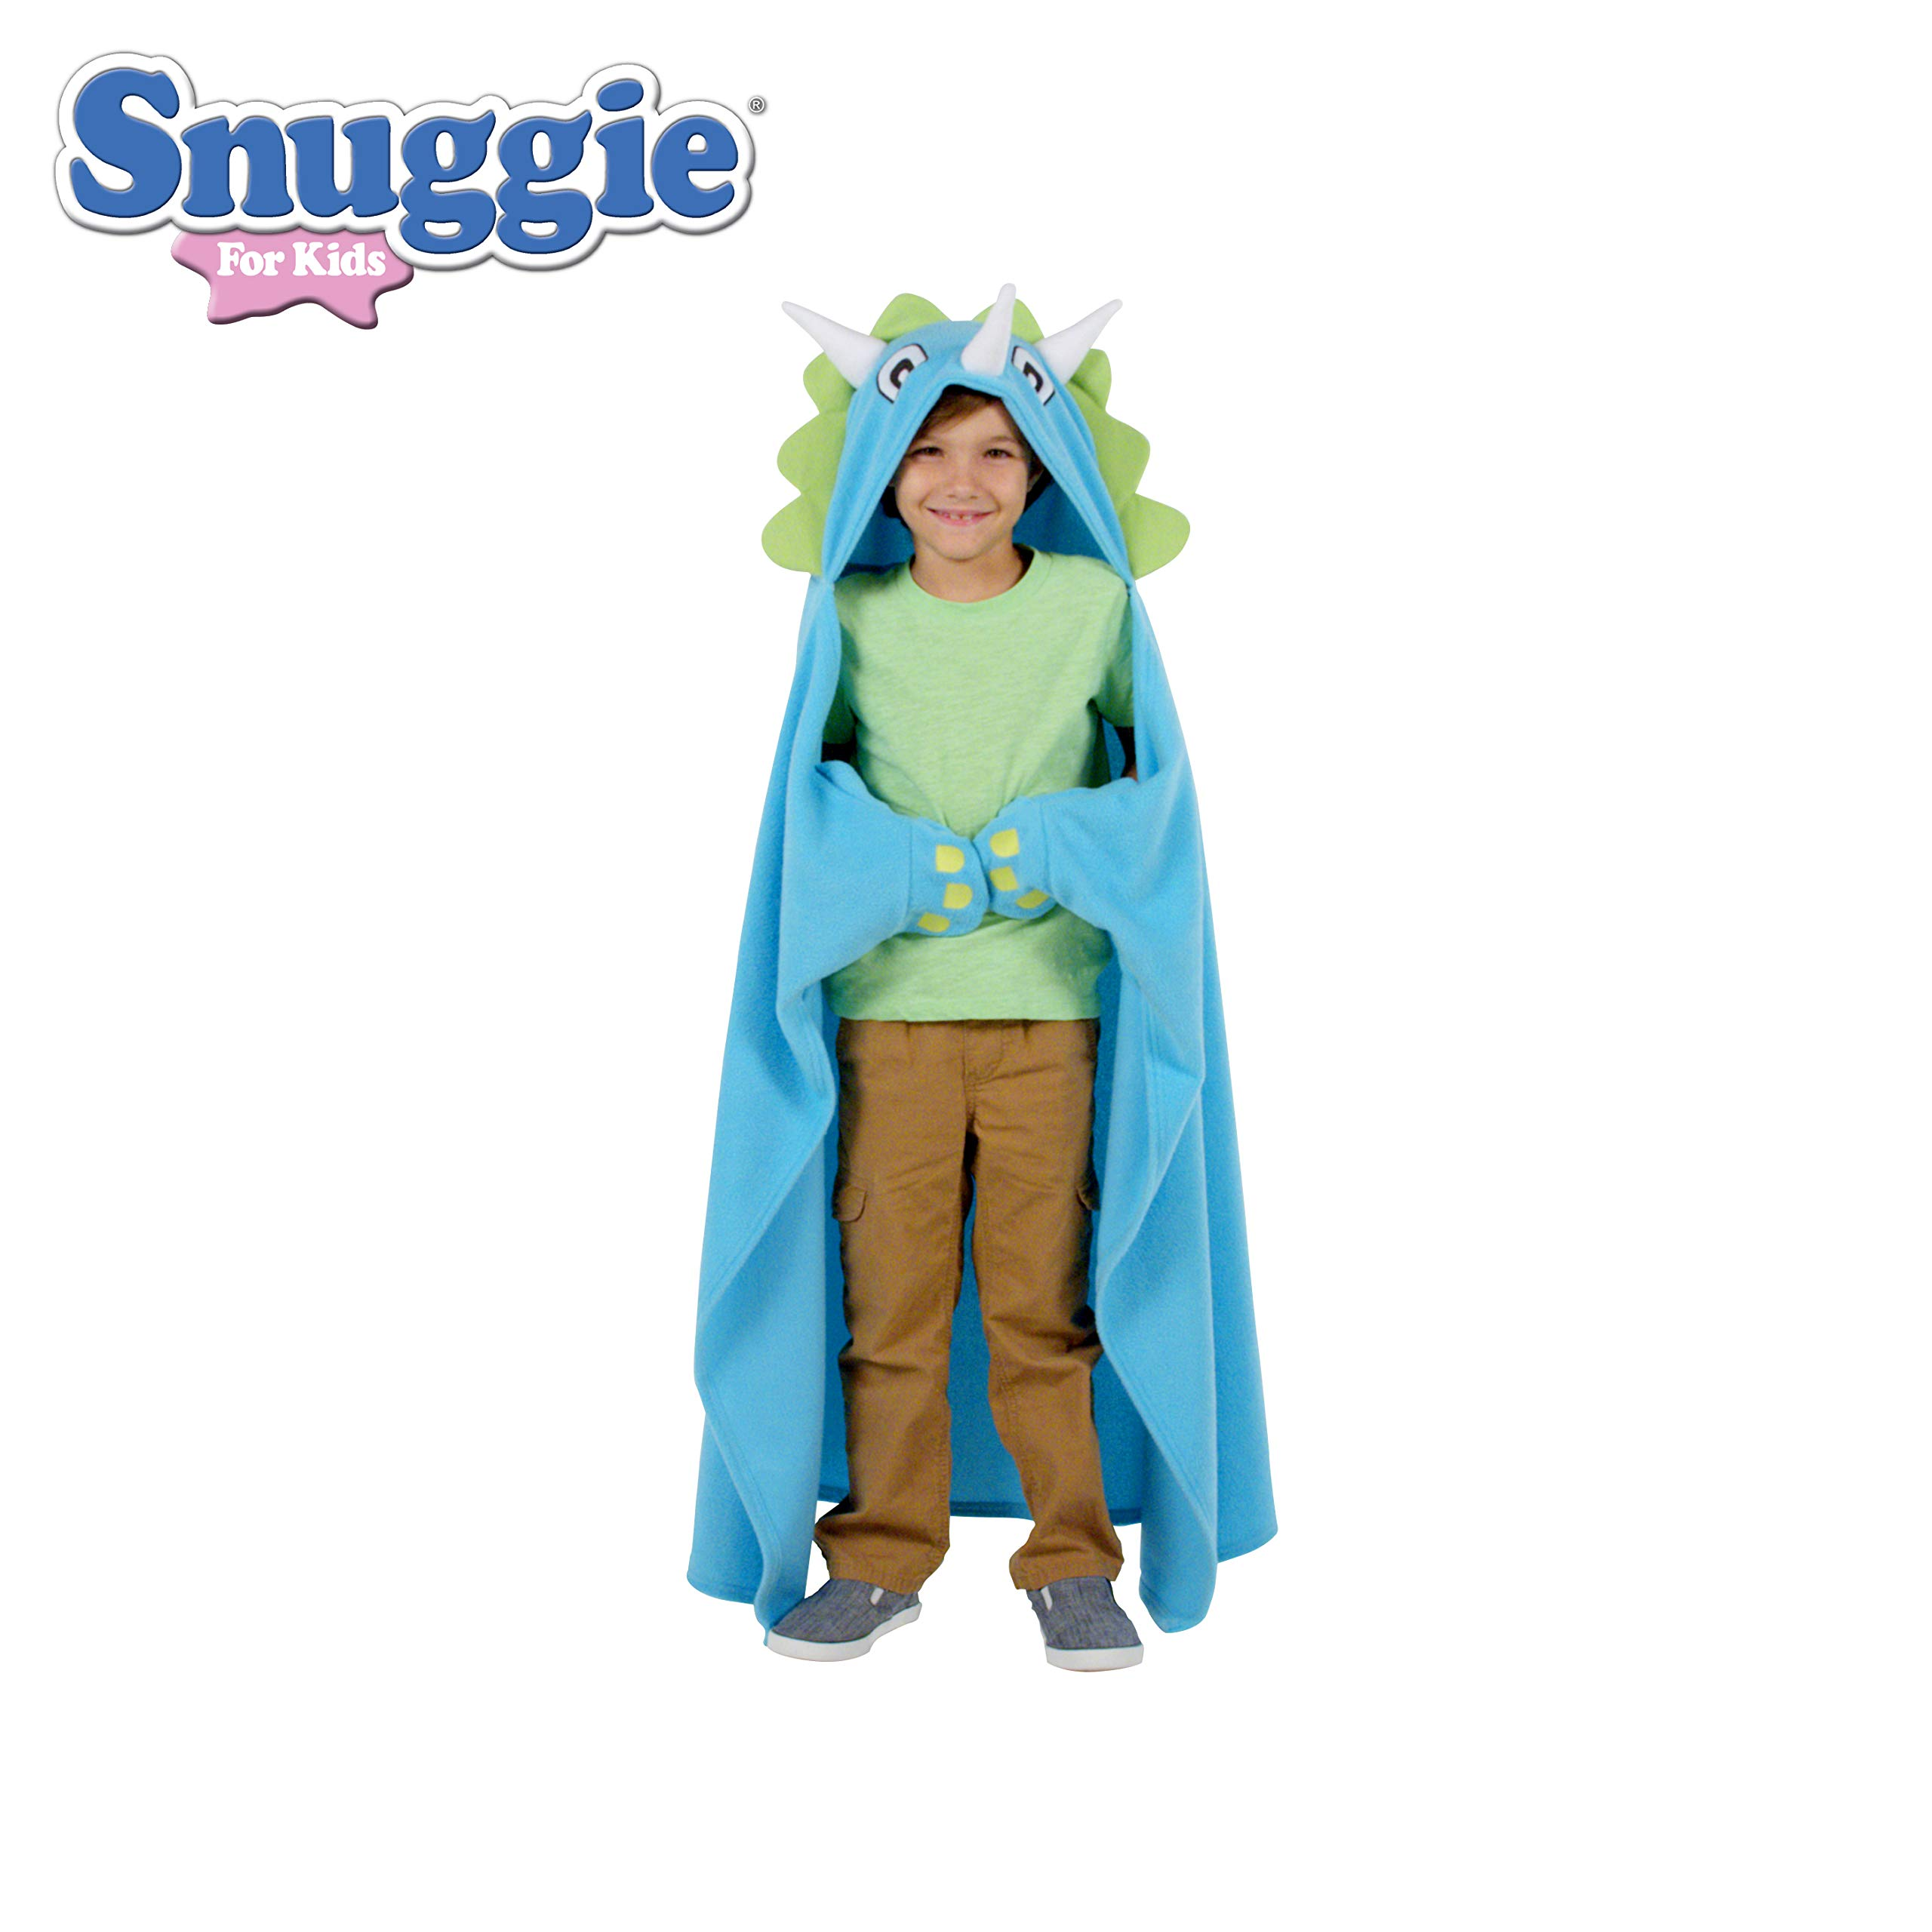 Snuggie - Kids Dinosaur Snuggie Tail Blanket with Sleeves, As Seen on TV, Blue by Snuggie